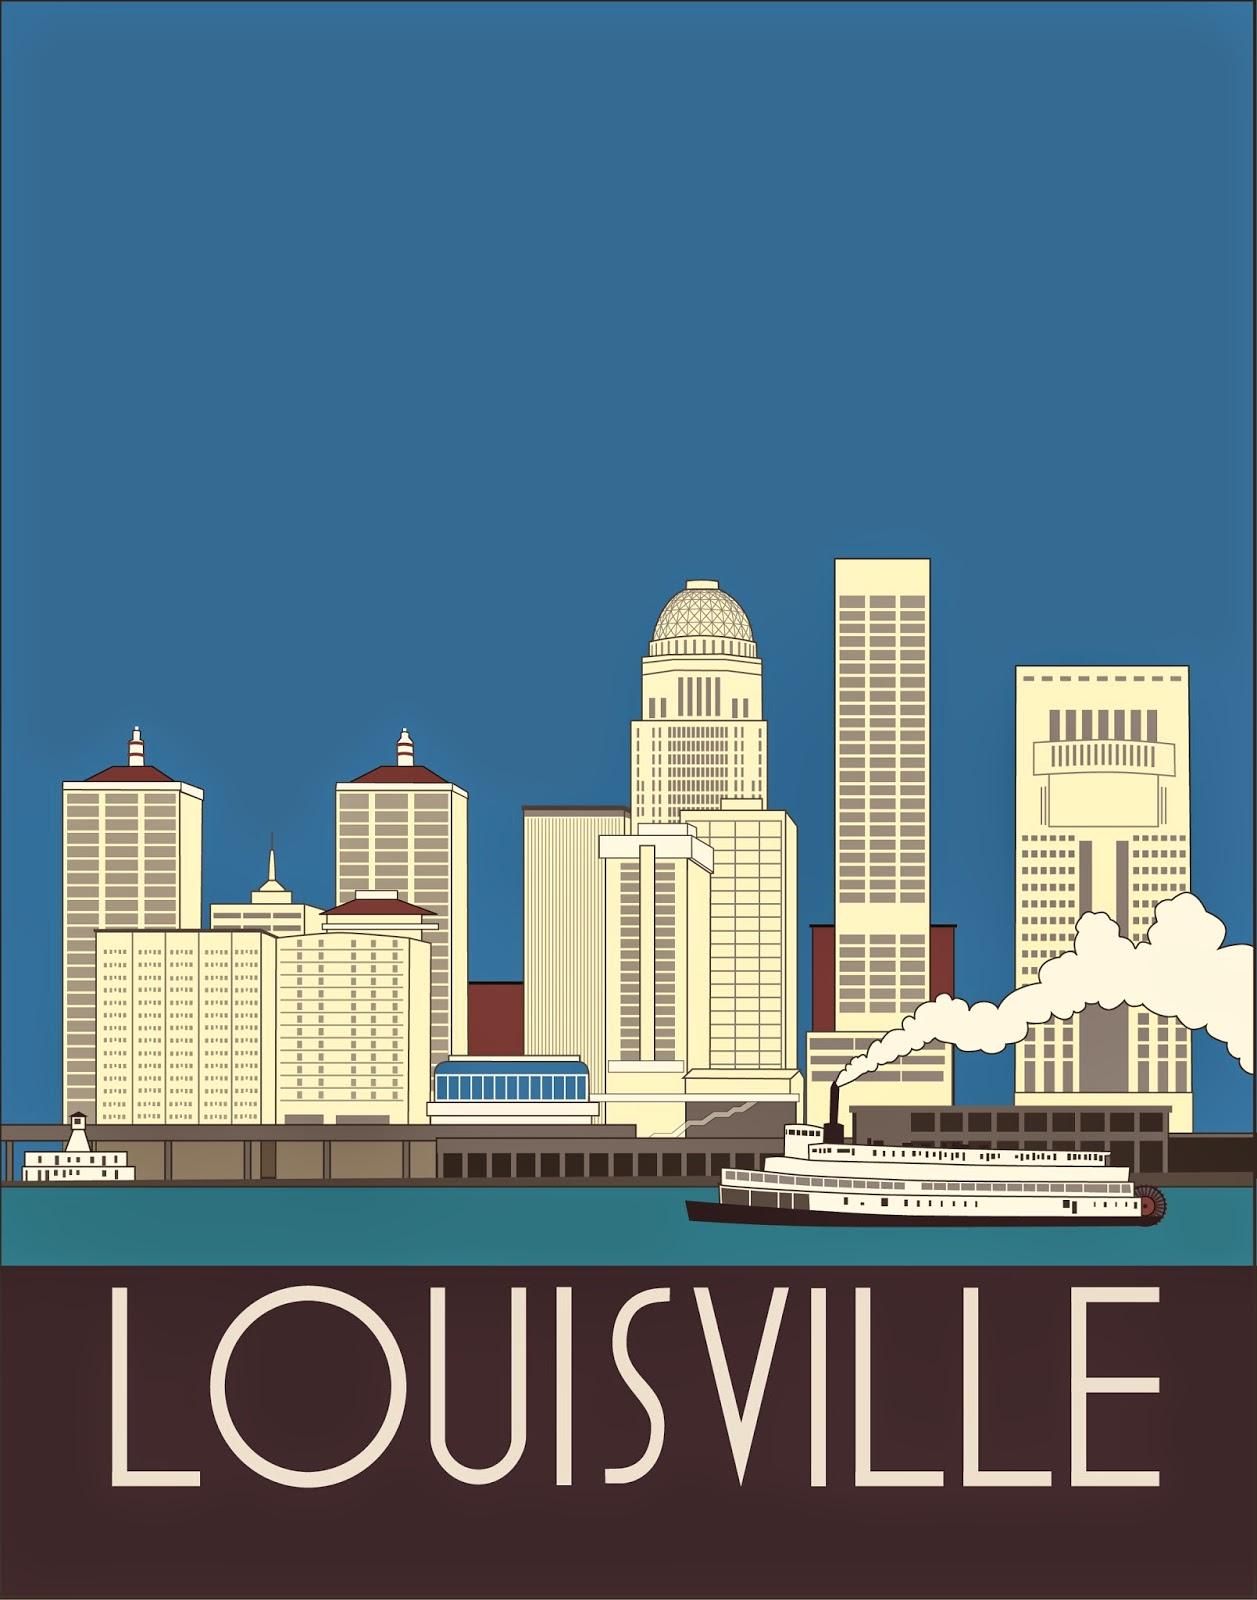 Louisville Kentucky Art Deco Skyline Josef Spalenka Adobe Illustrator